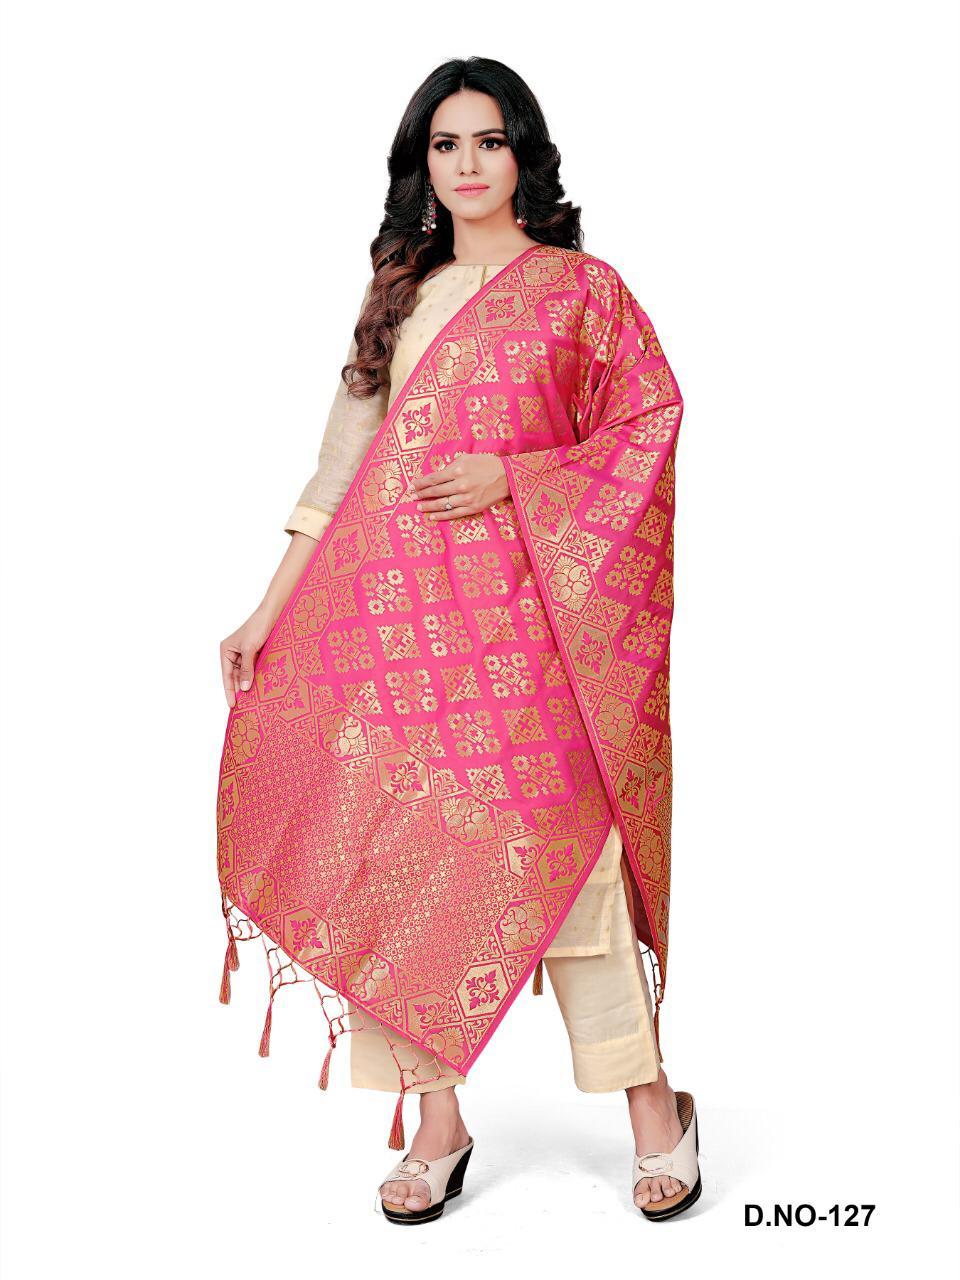 Mrigya Present Premium Quality Banarasi Silk Dupatta Collection